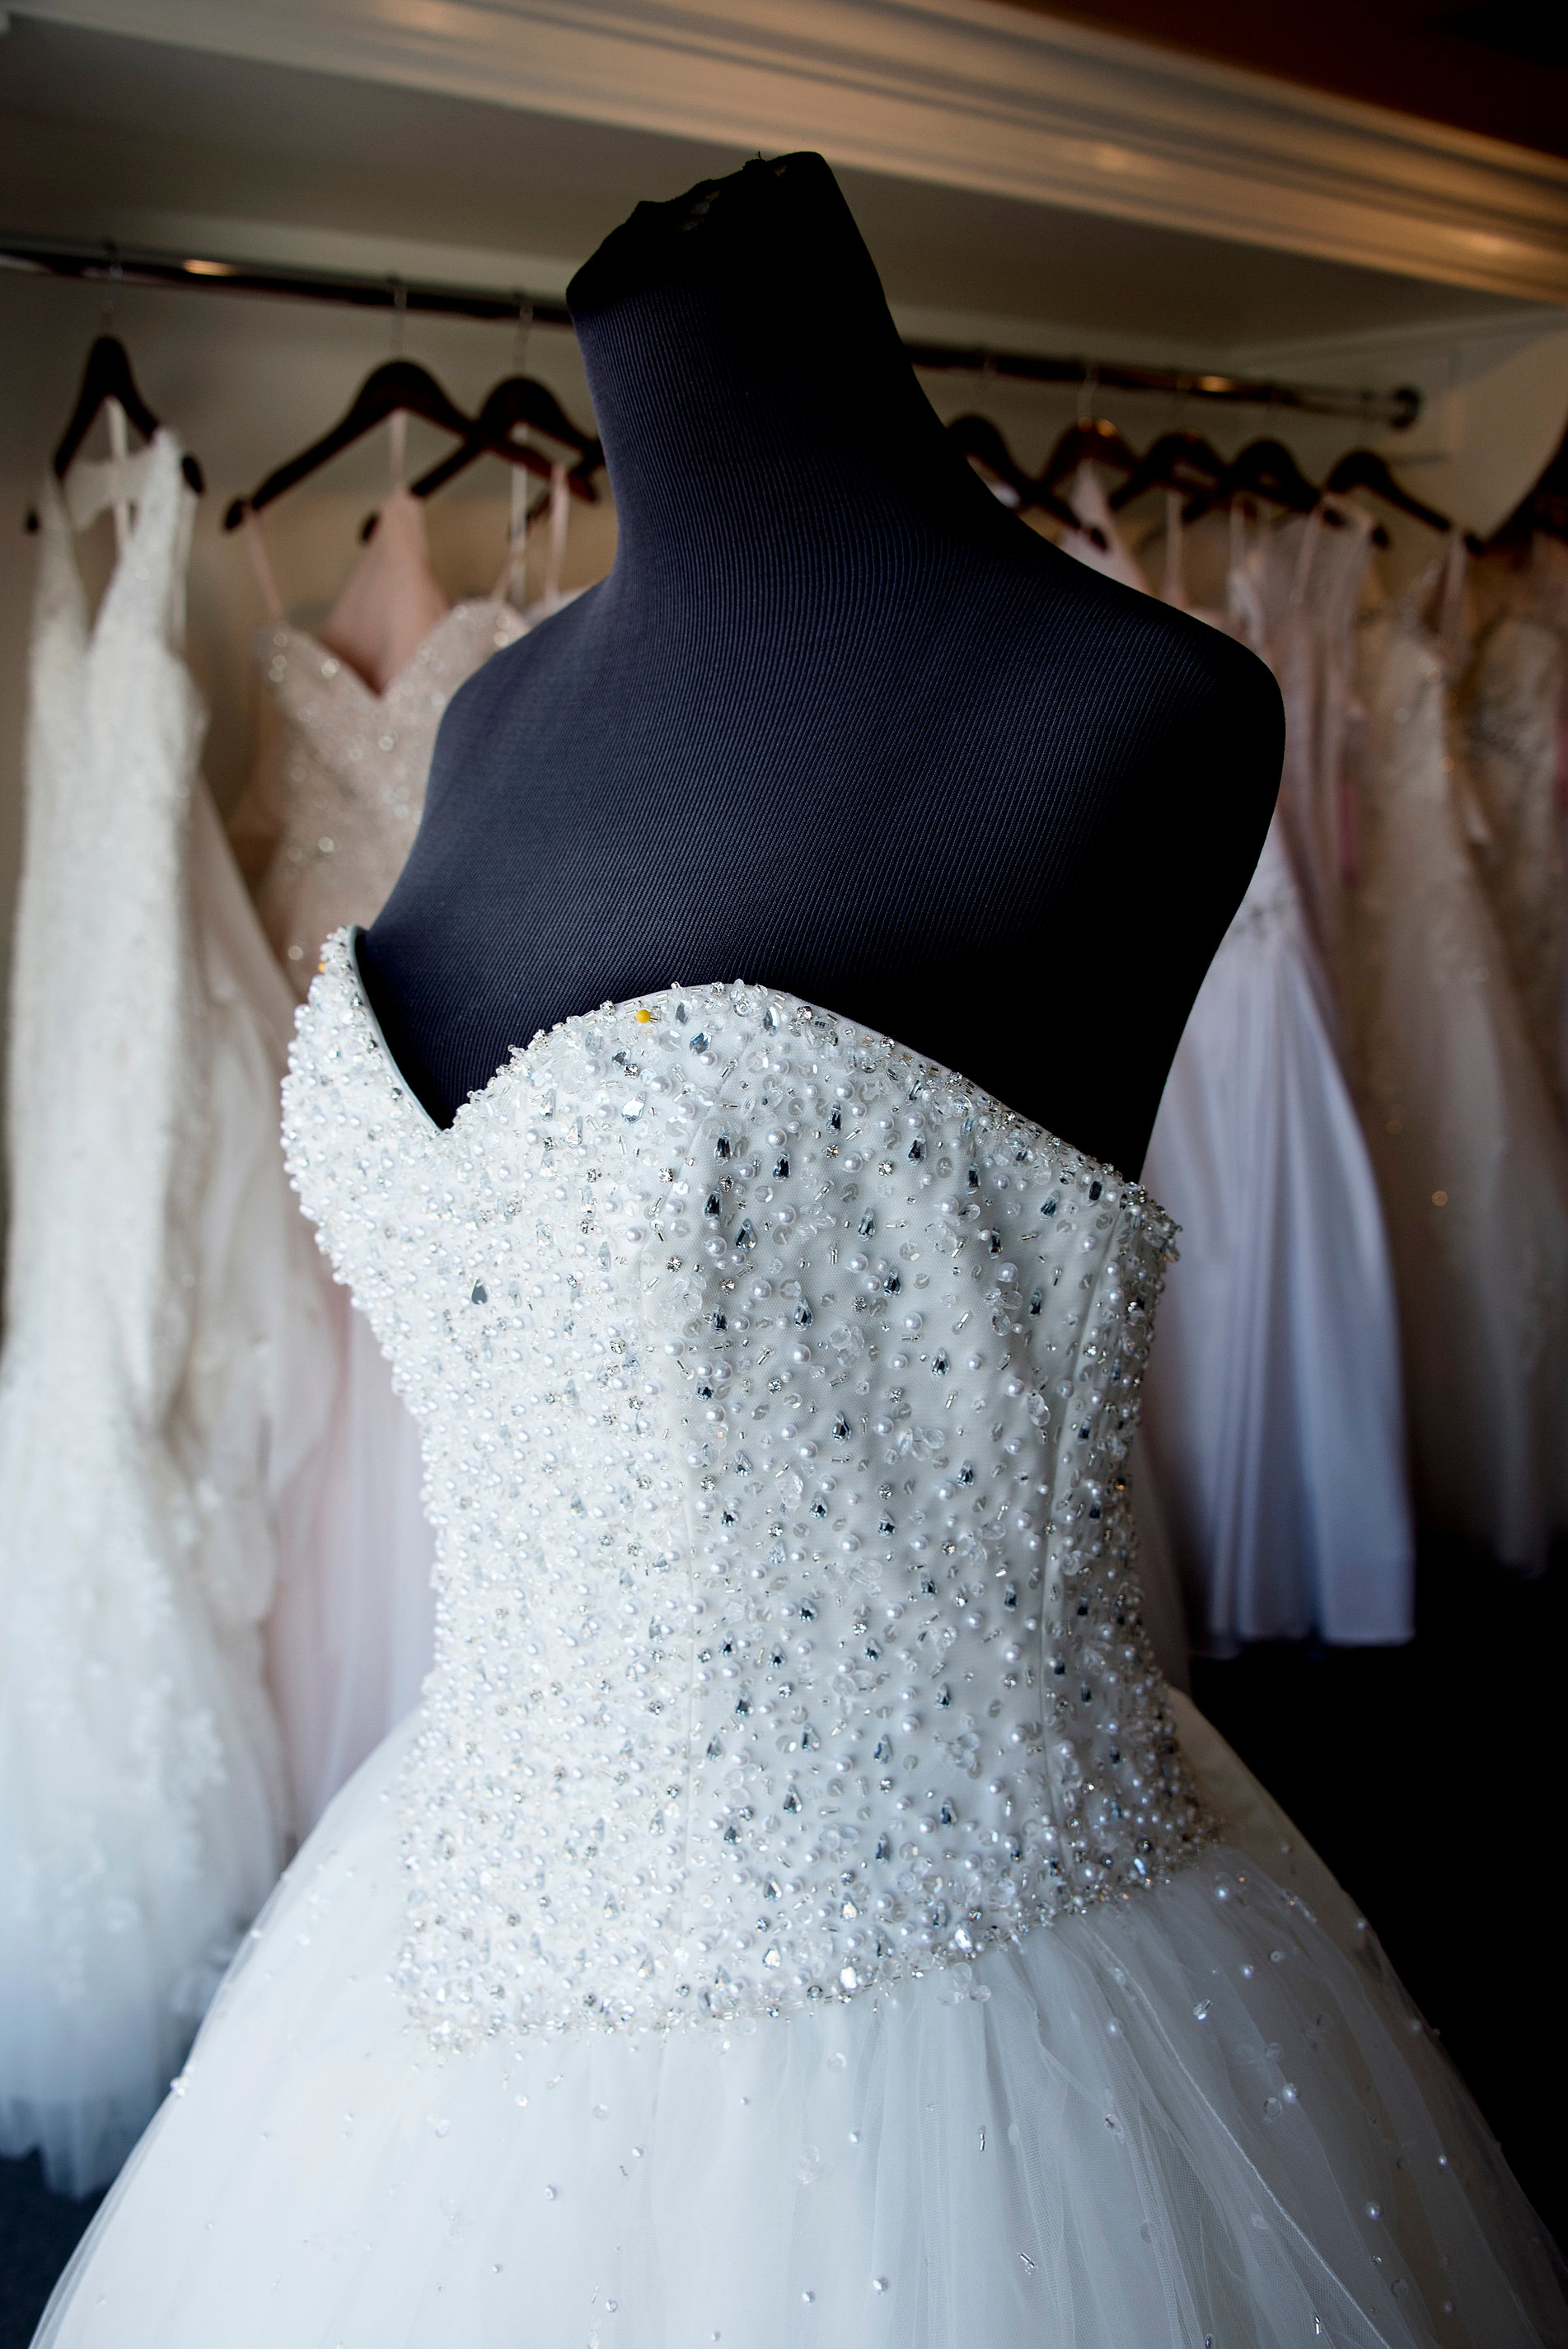 Unique Personalized Wedding Dress Hanger Sketch - All Wedding ...